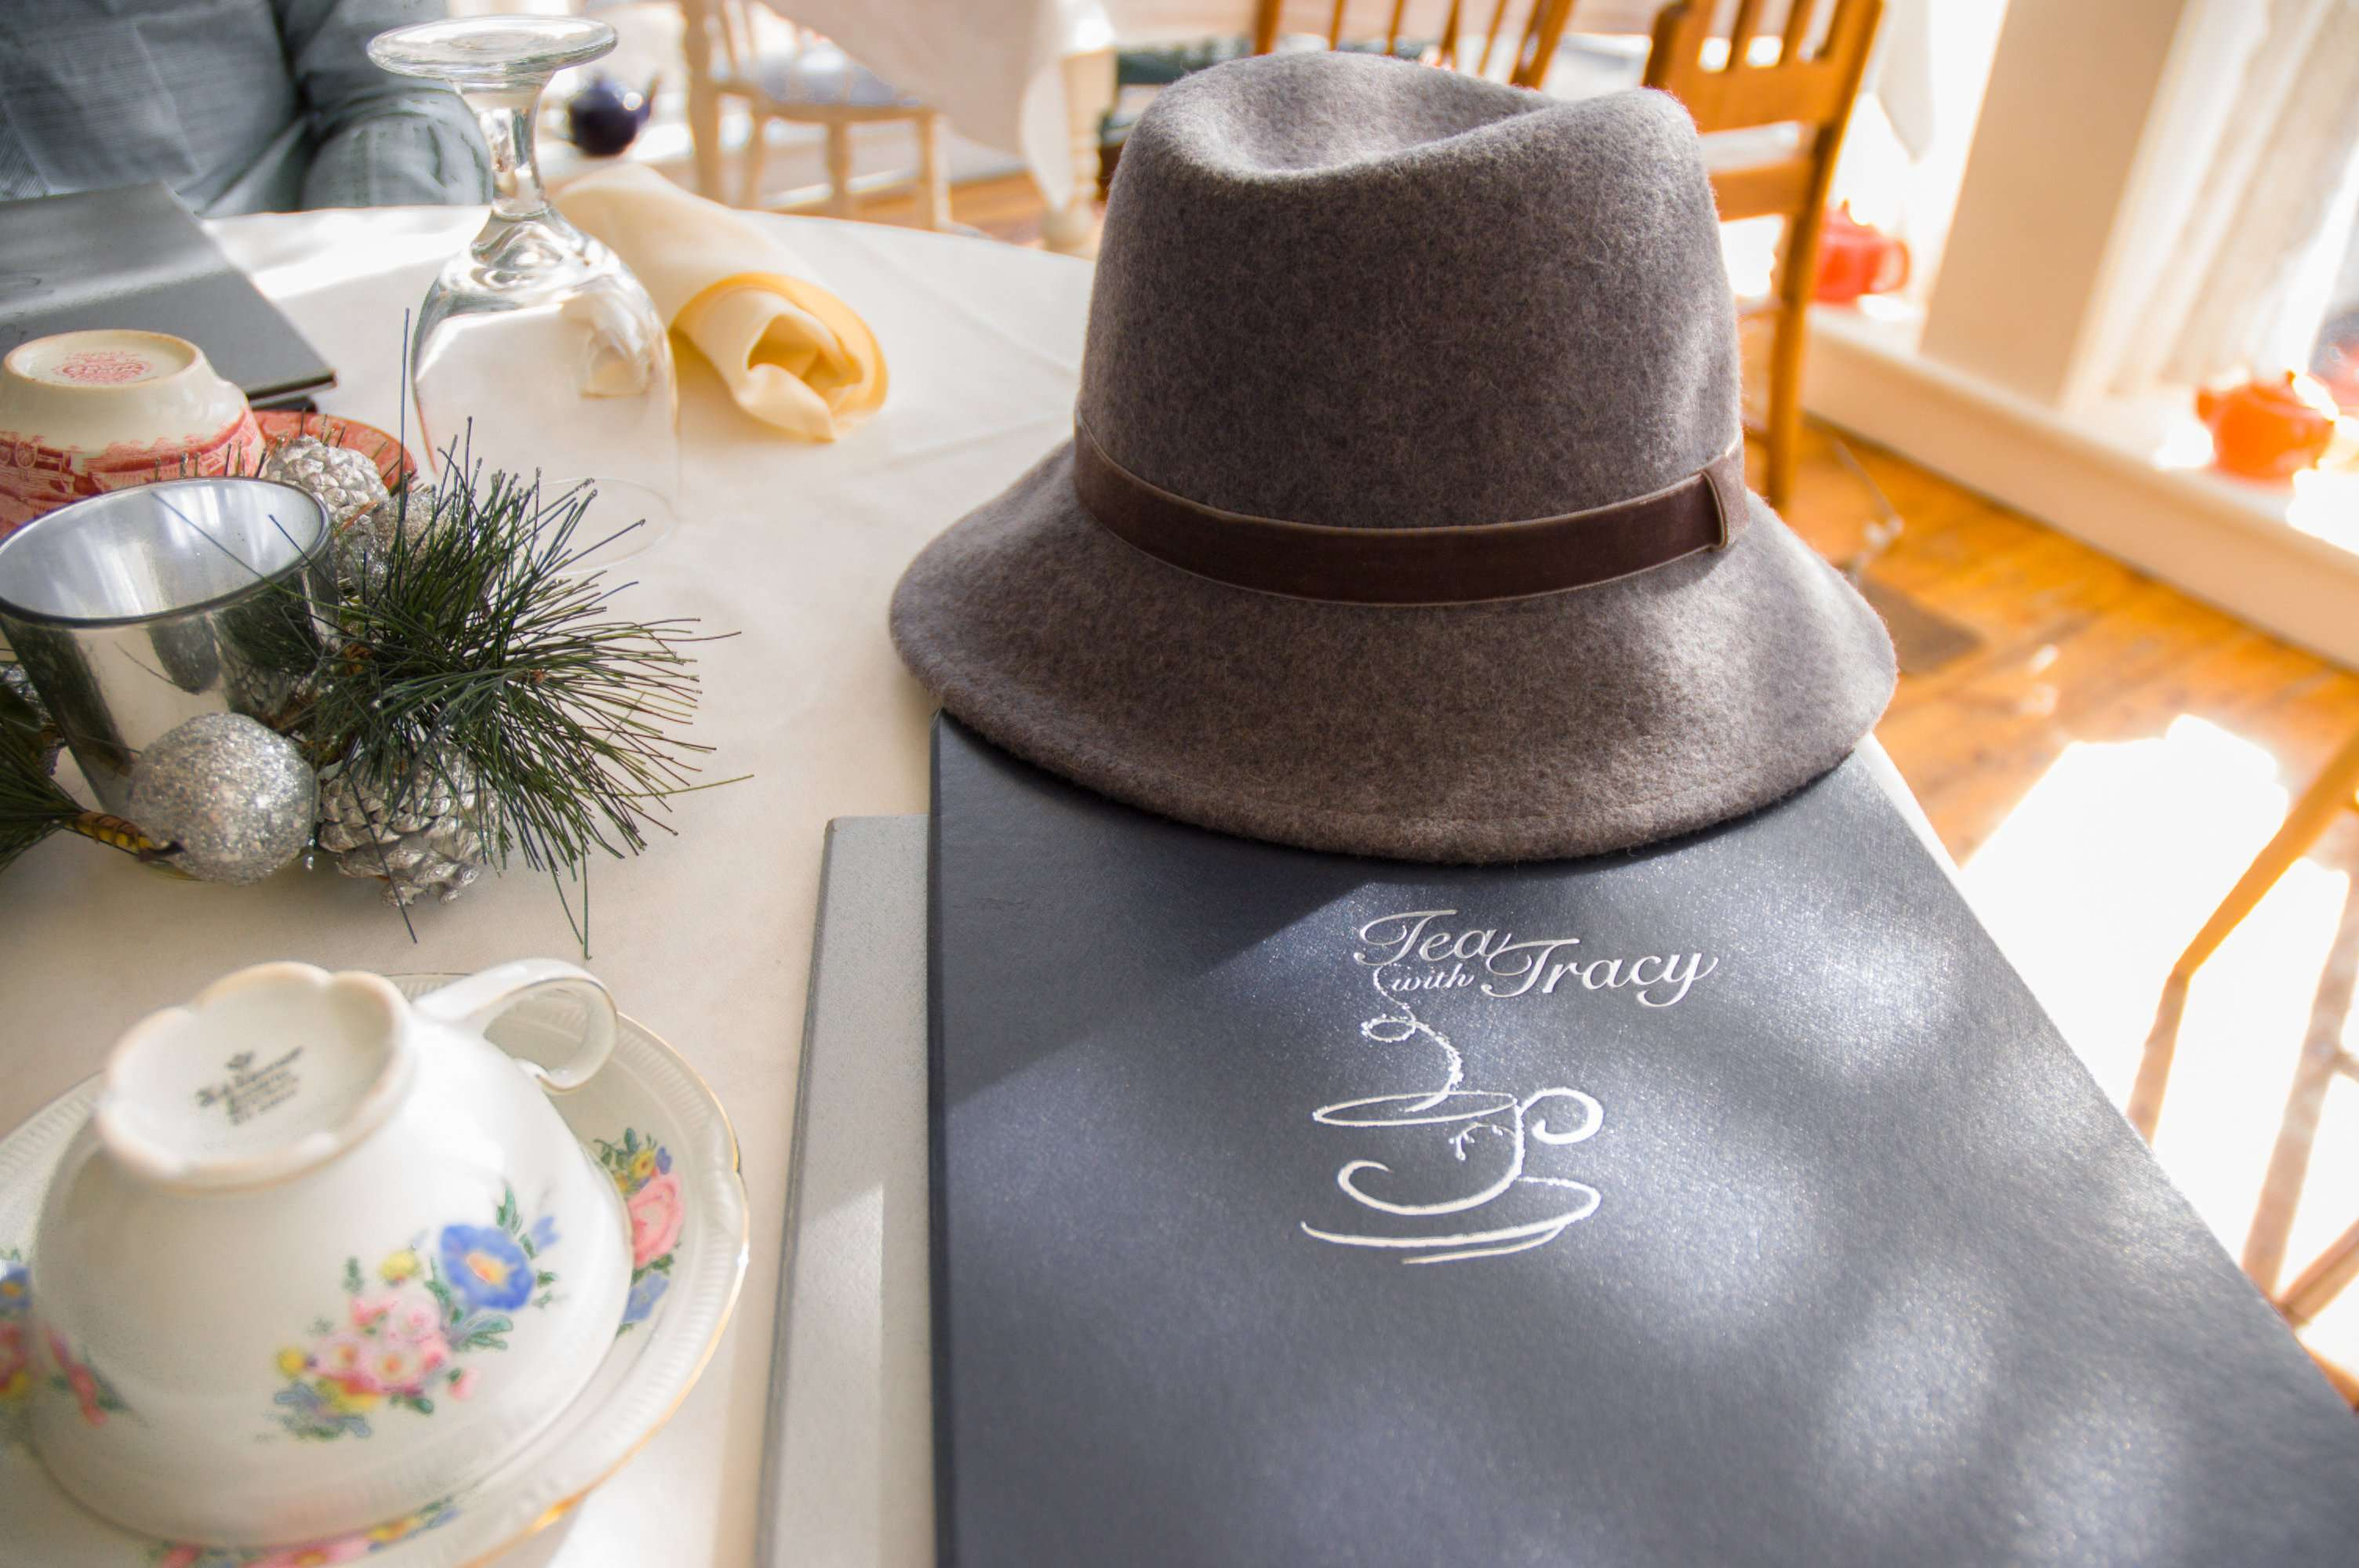 The menu of teas